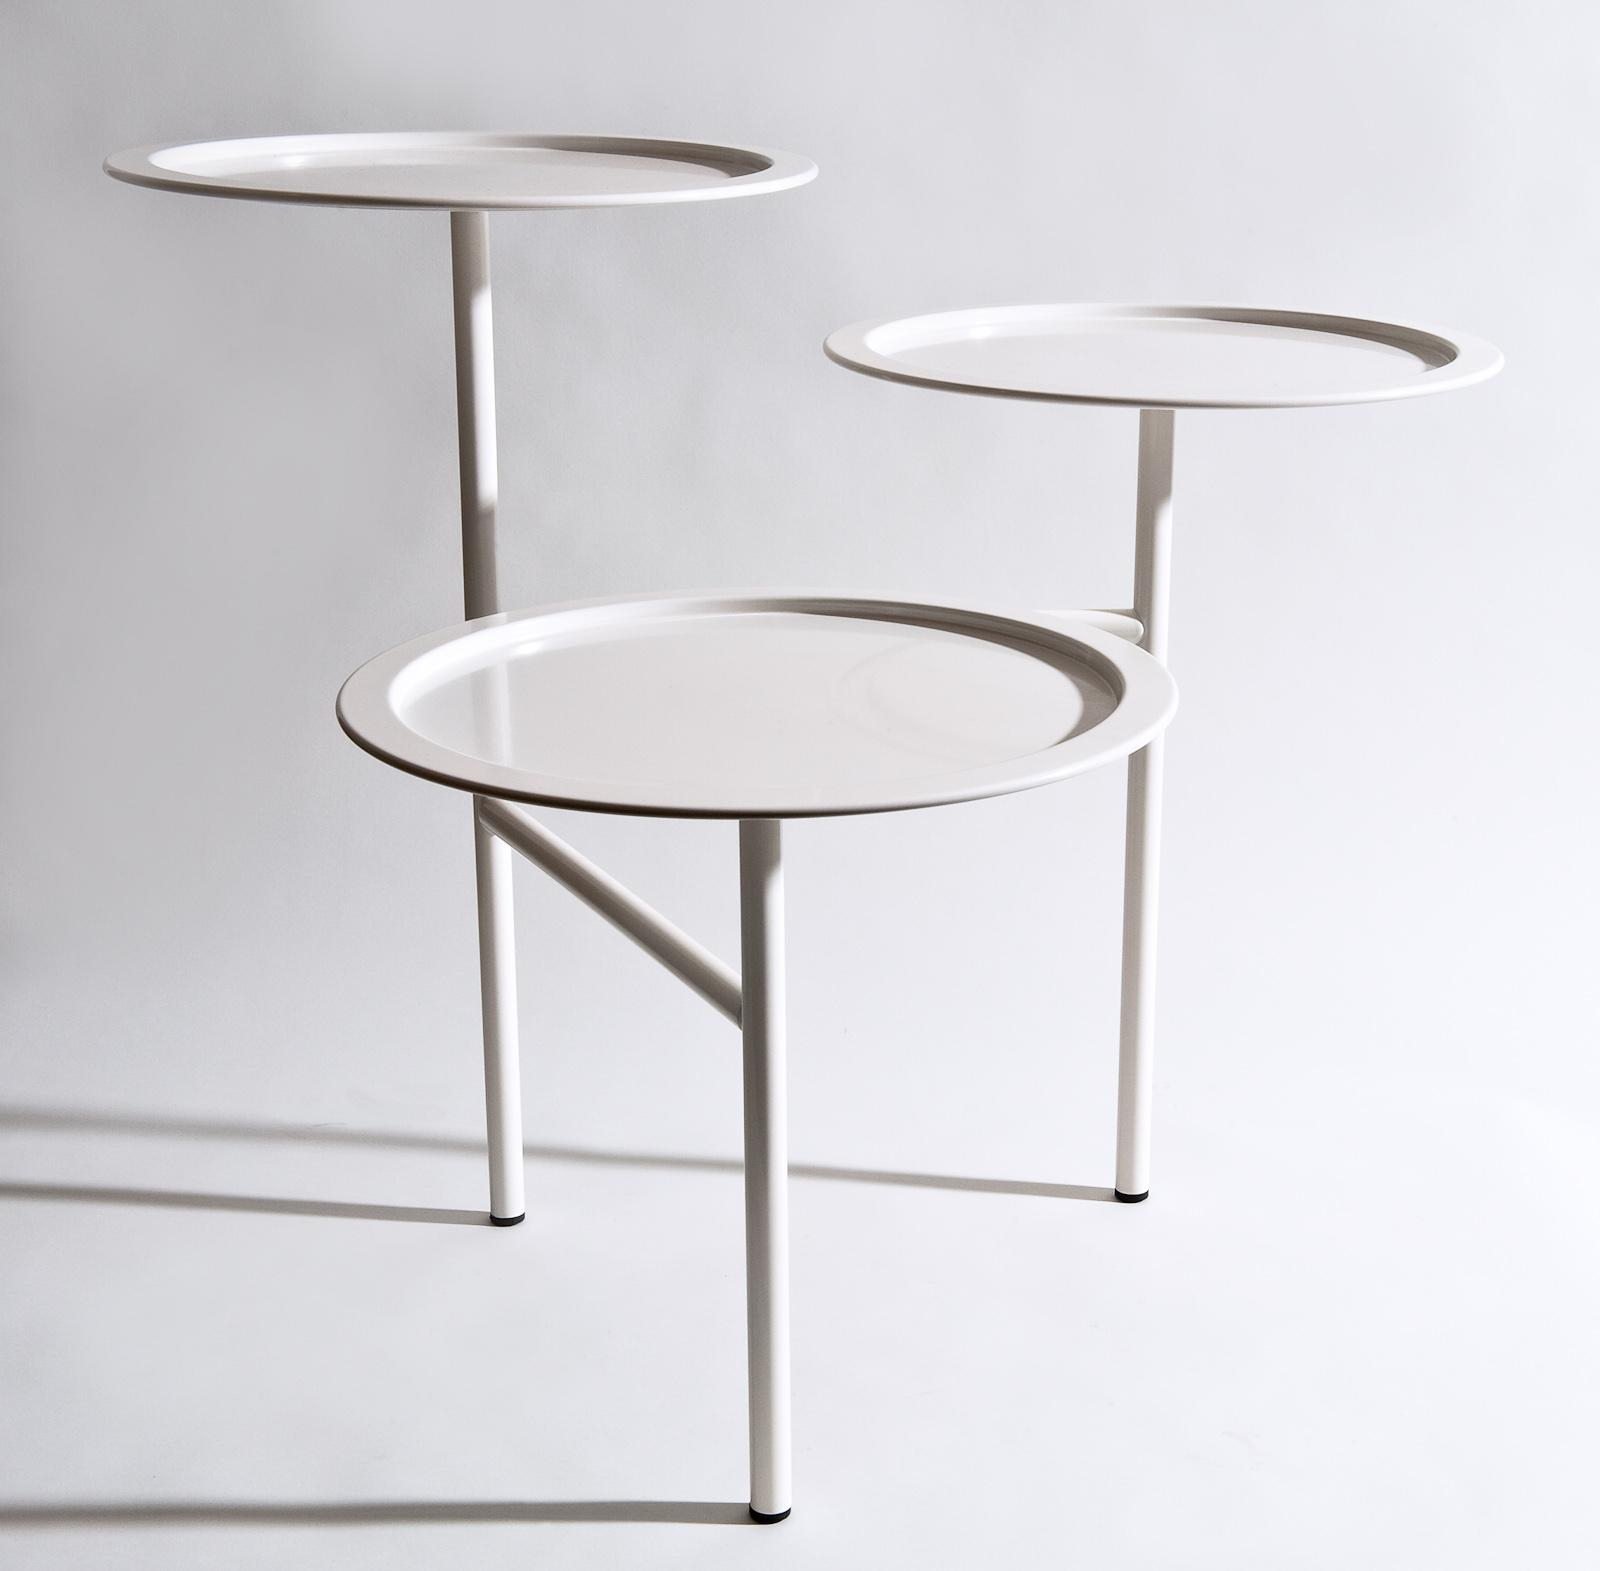 Tavolino in acciaio bianco Calder, Driade